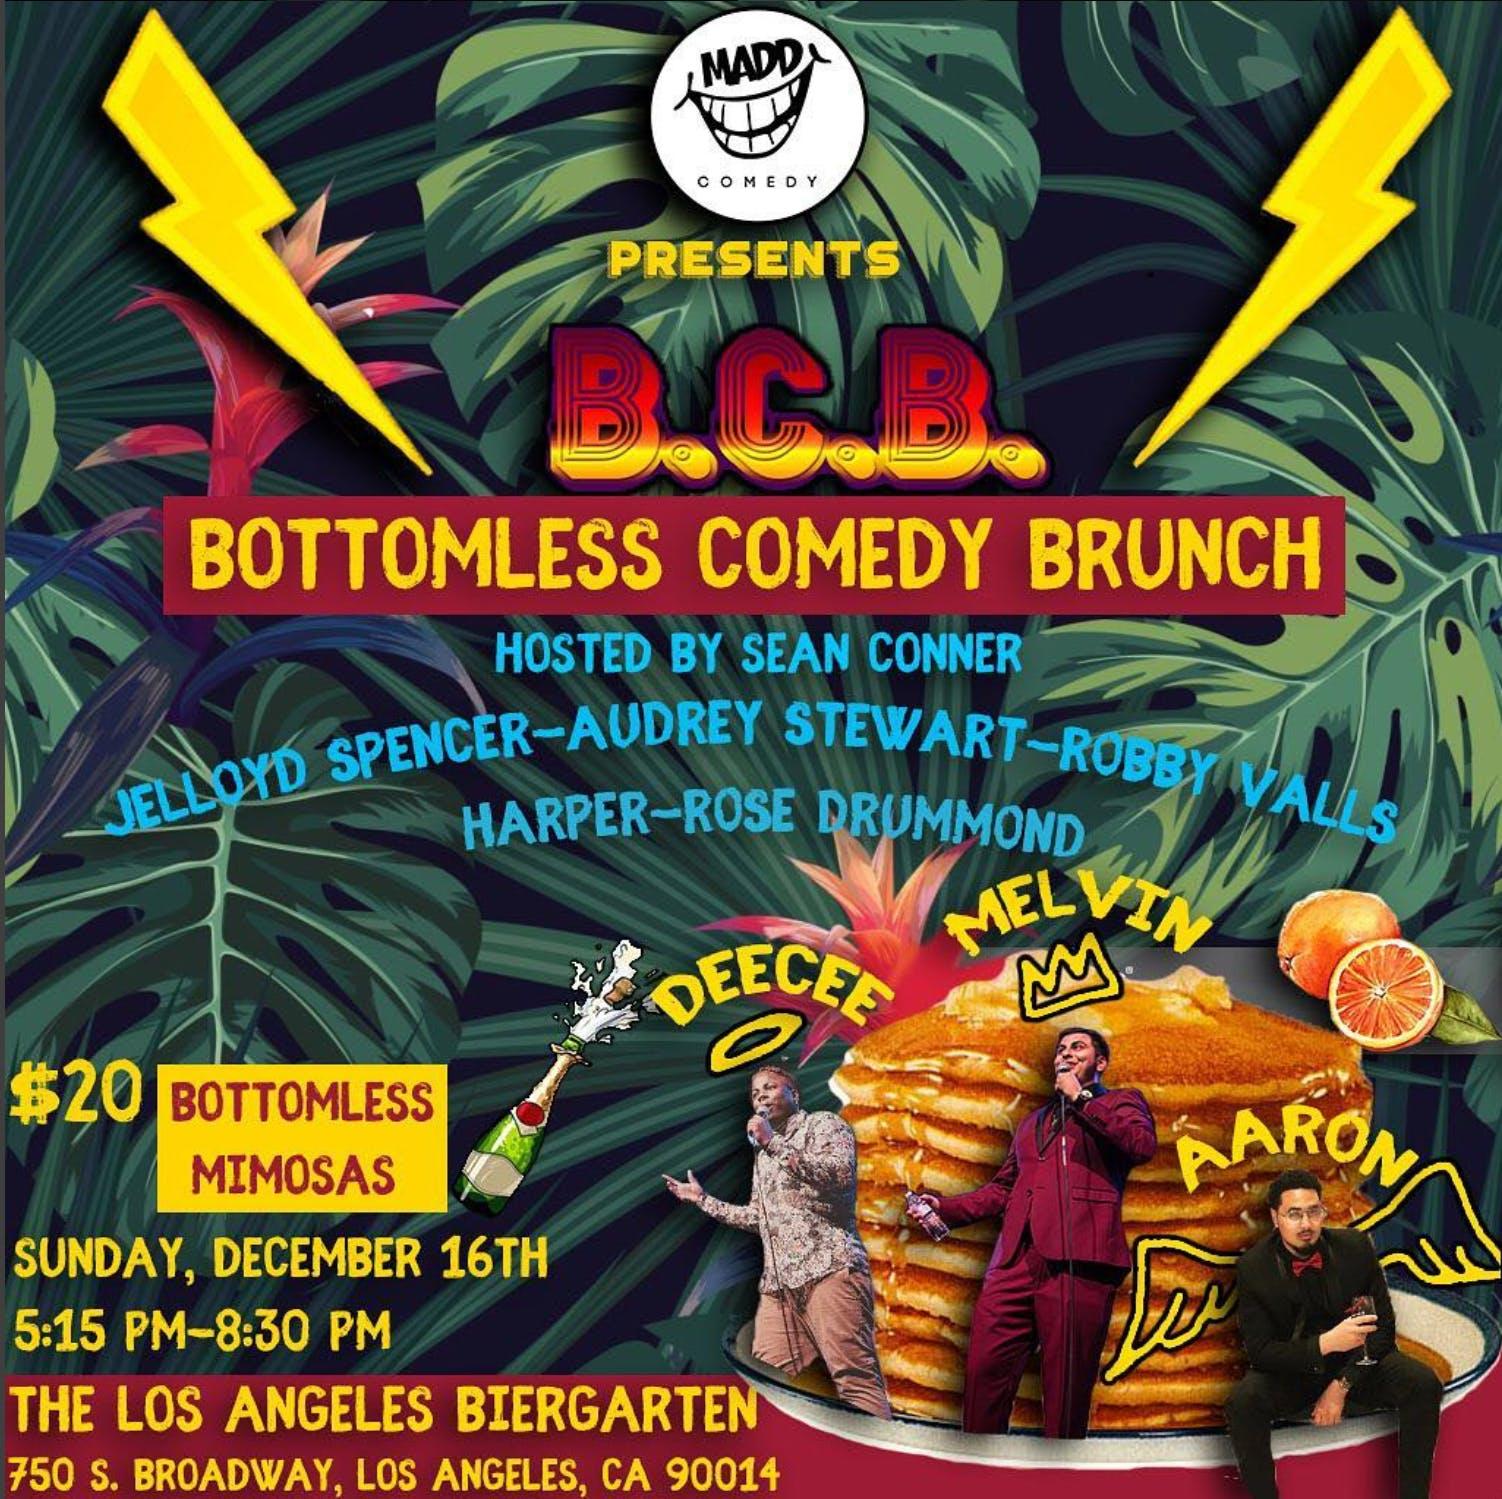 Bottomless Comedy Brunch